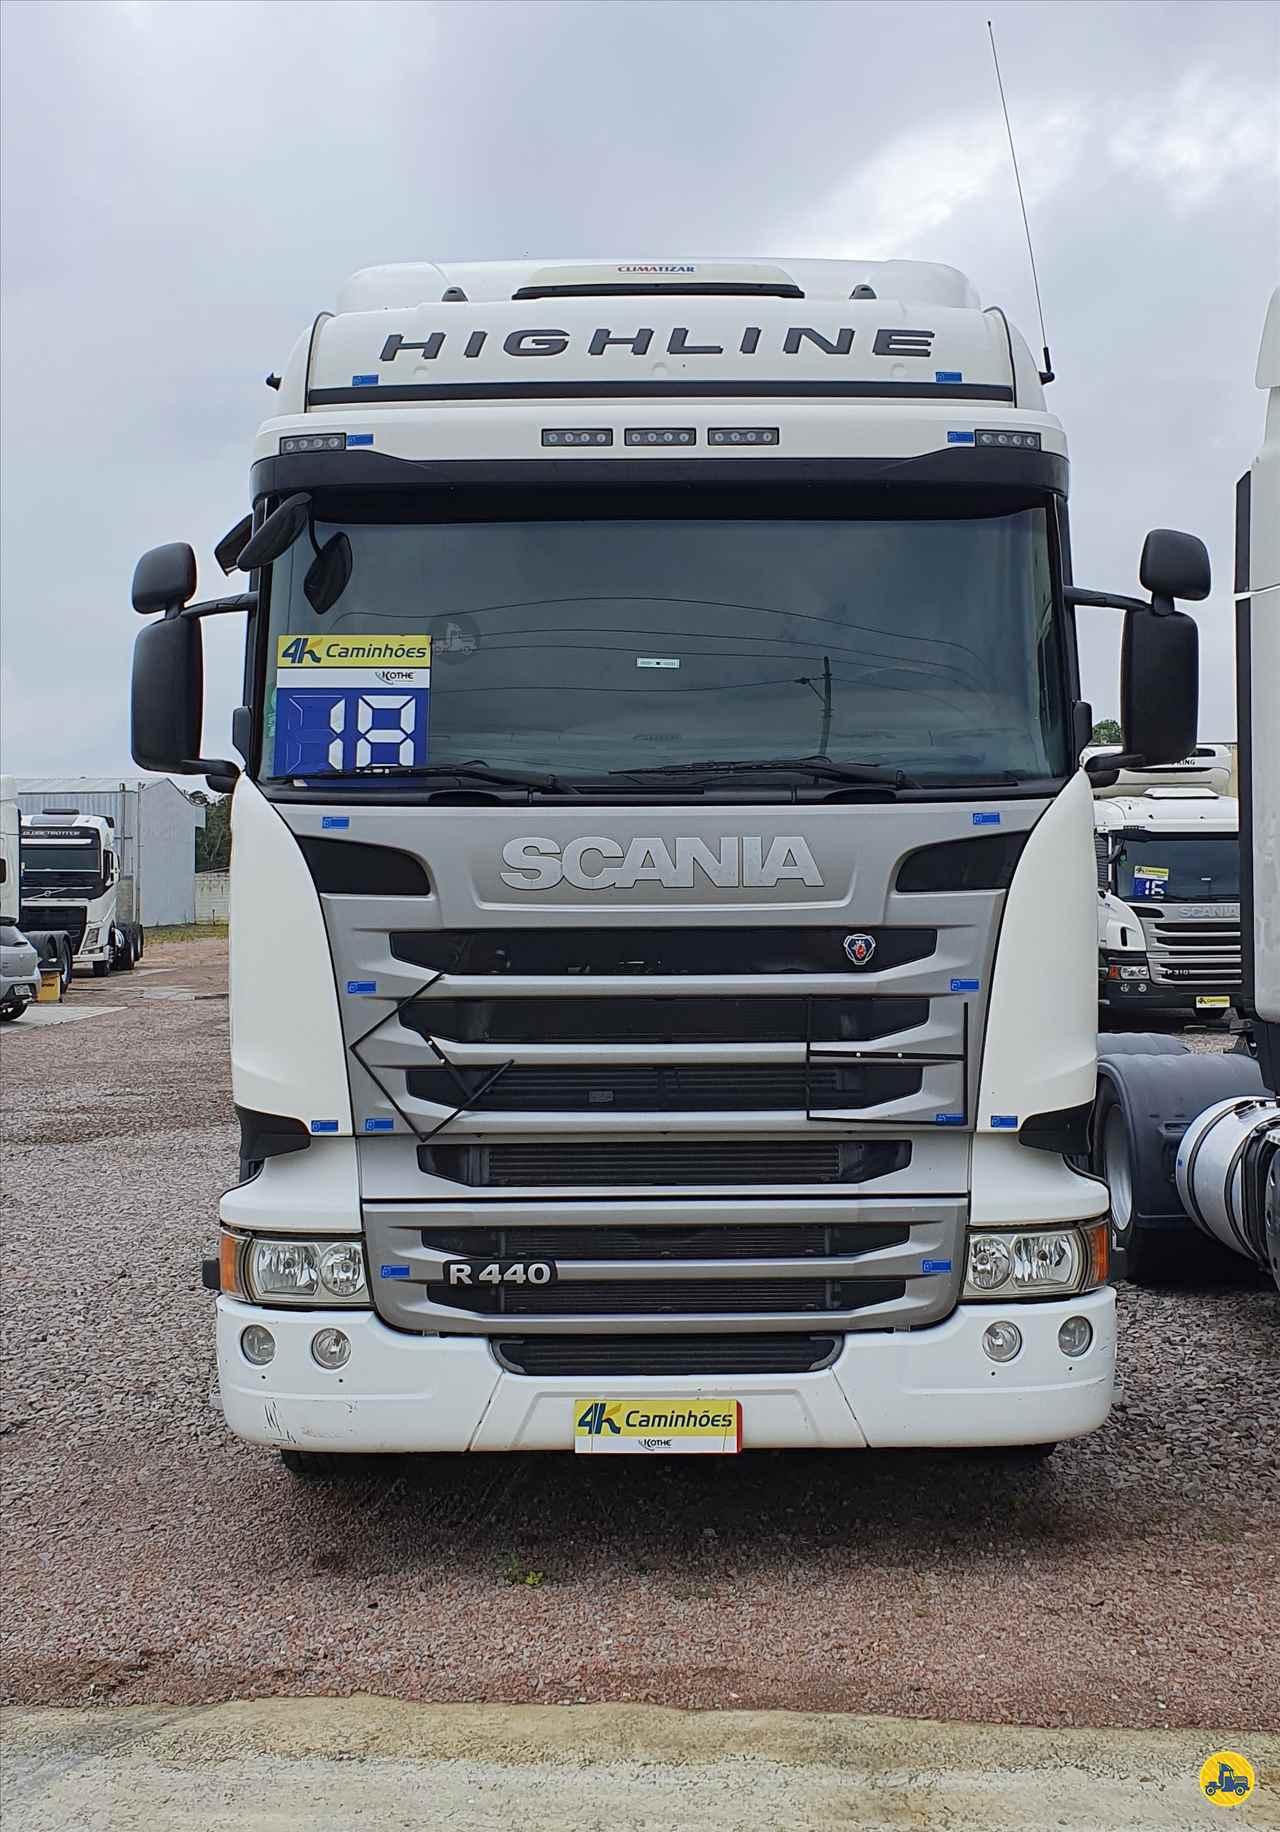 CAMINHAO SCANIA SCANIA 440 Cavalo Mecânico Truck 6x2 4K Caminhões - Itajaí ITAJAI SANTA CATARINA SC